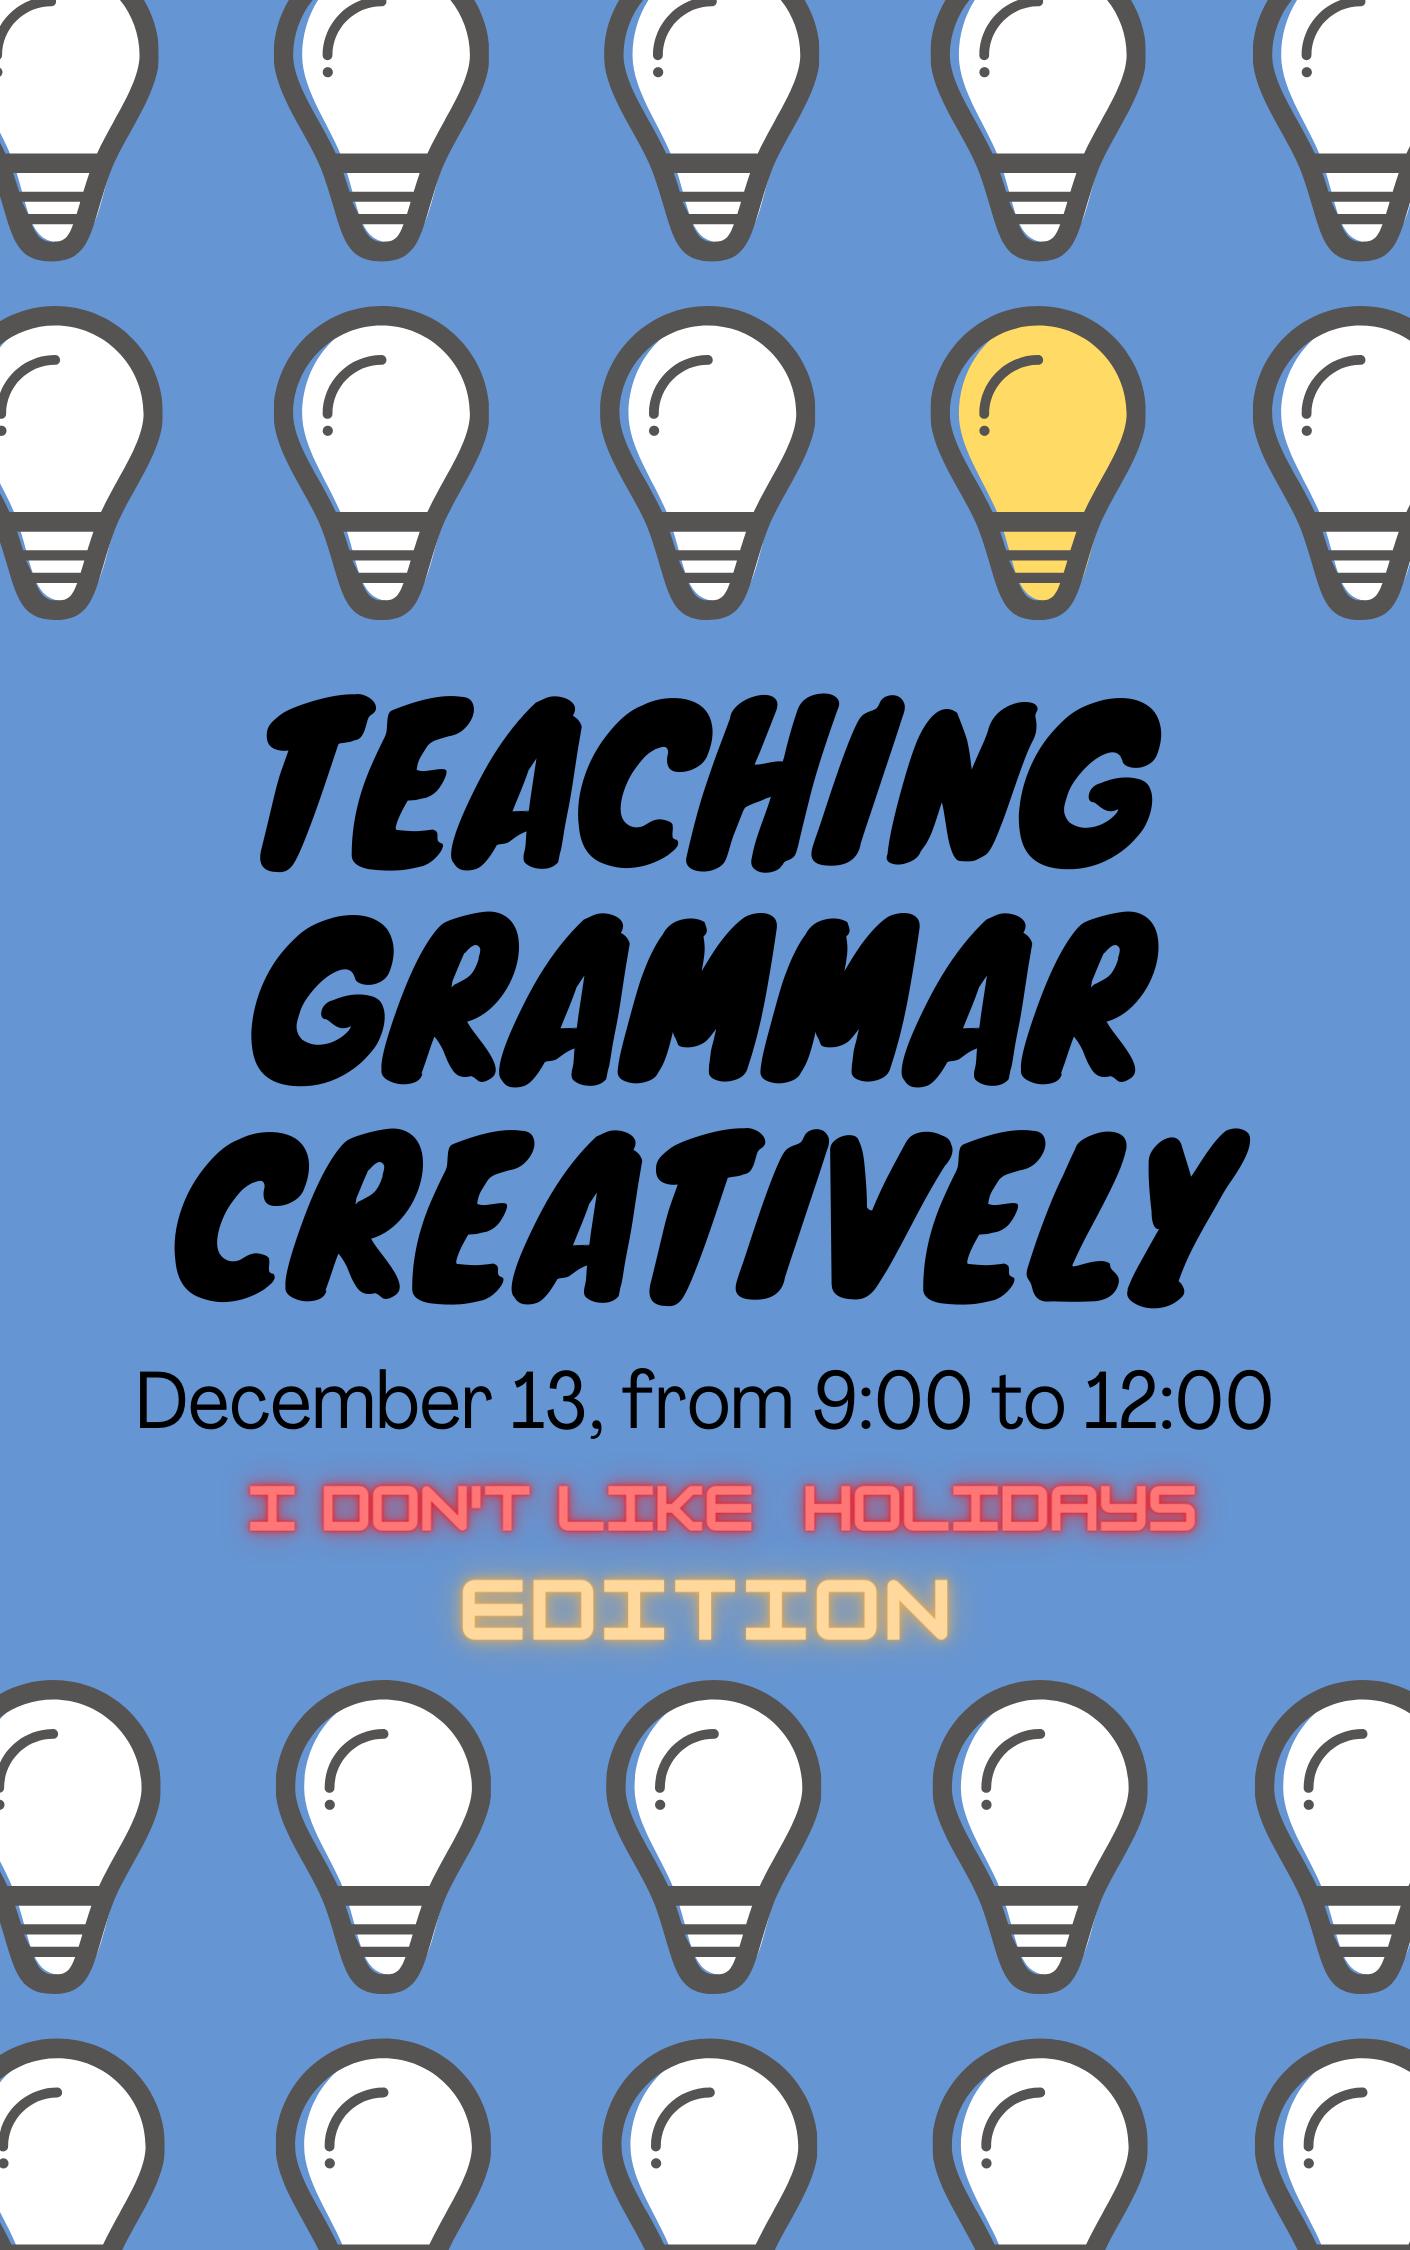 teaching-grammar-creatively-5